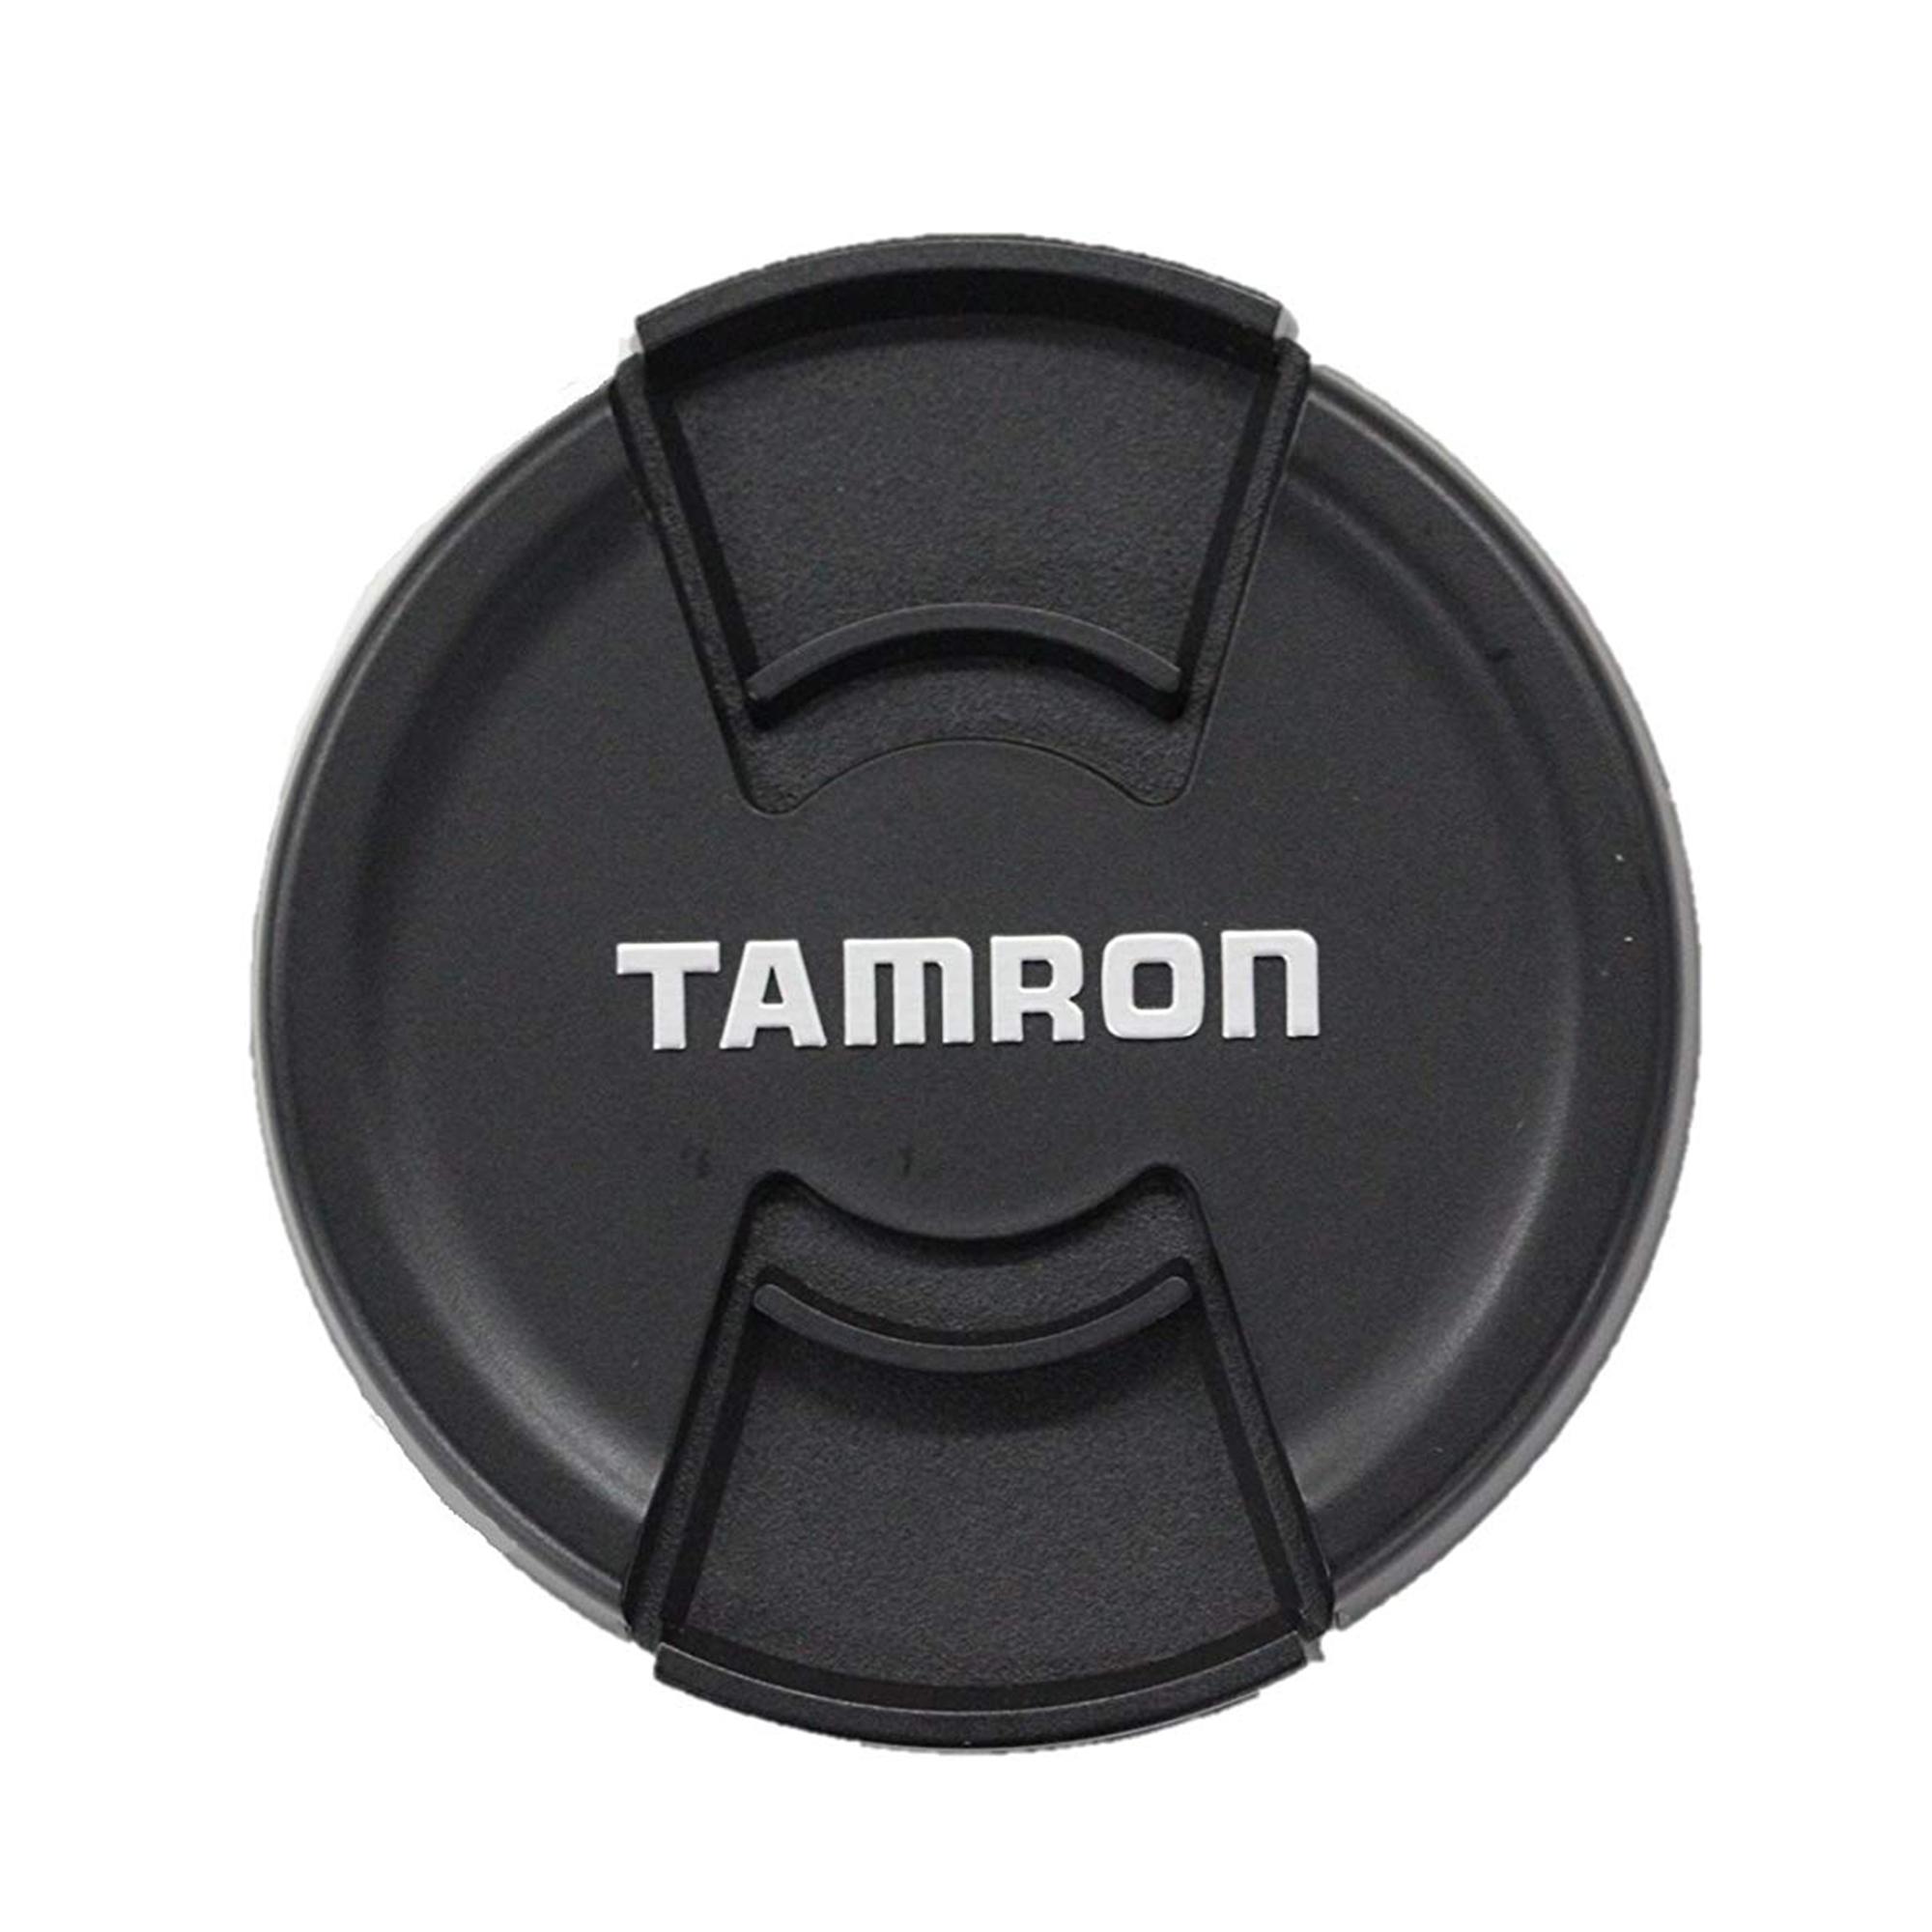 Tamron 72mm Front Lens Cap